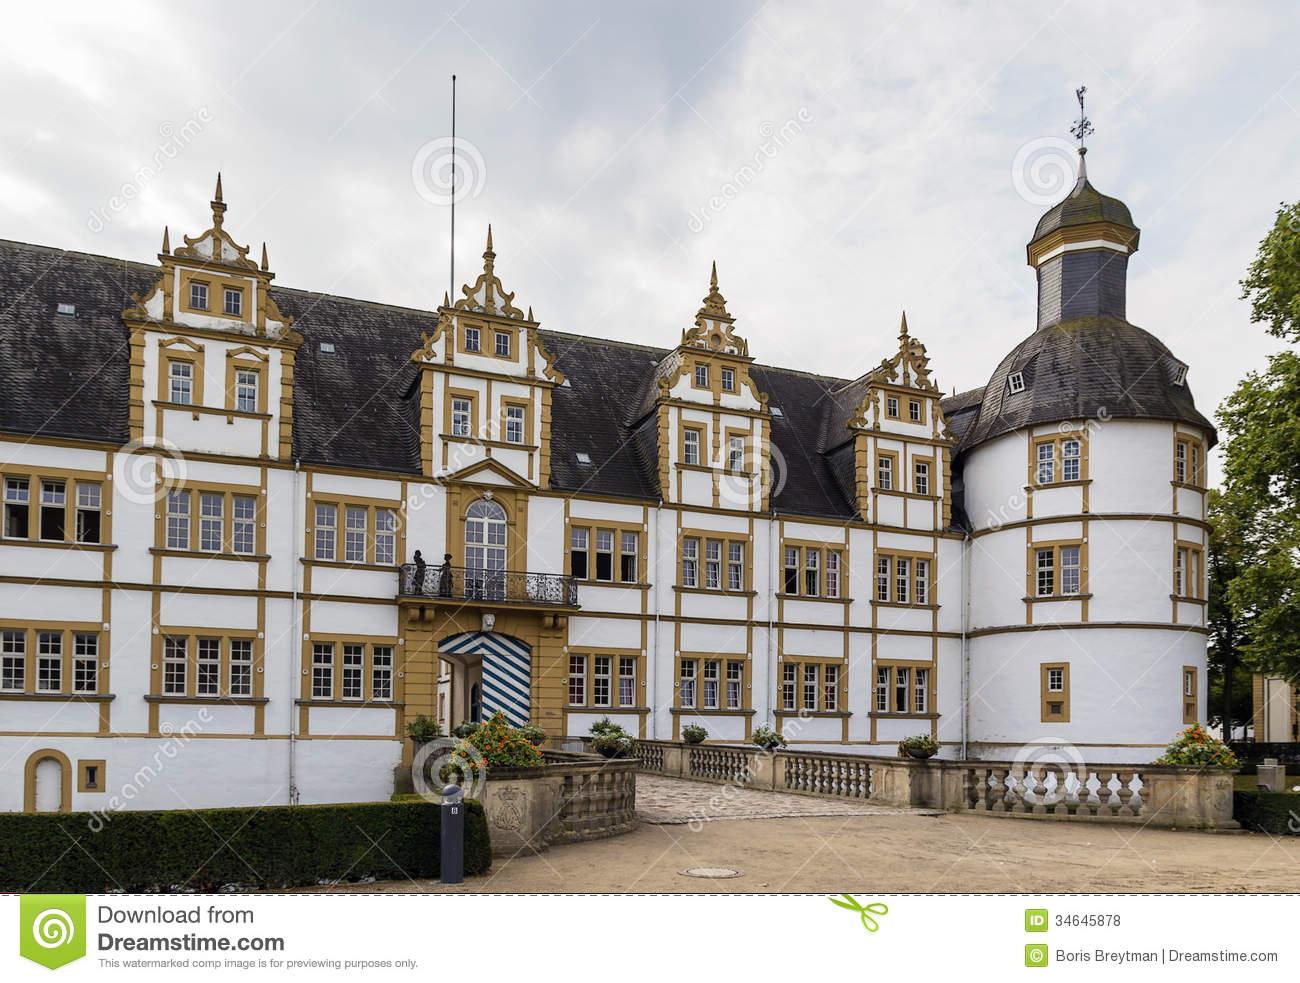 Neuhaus Castle In Paderborn, Germany Royalty Free Stock Photos.